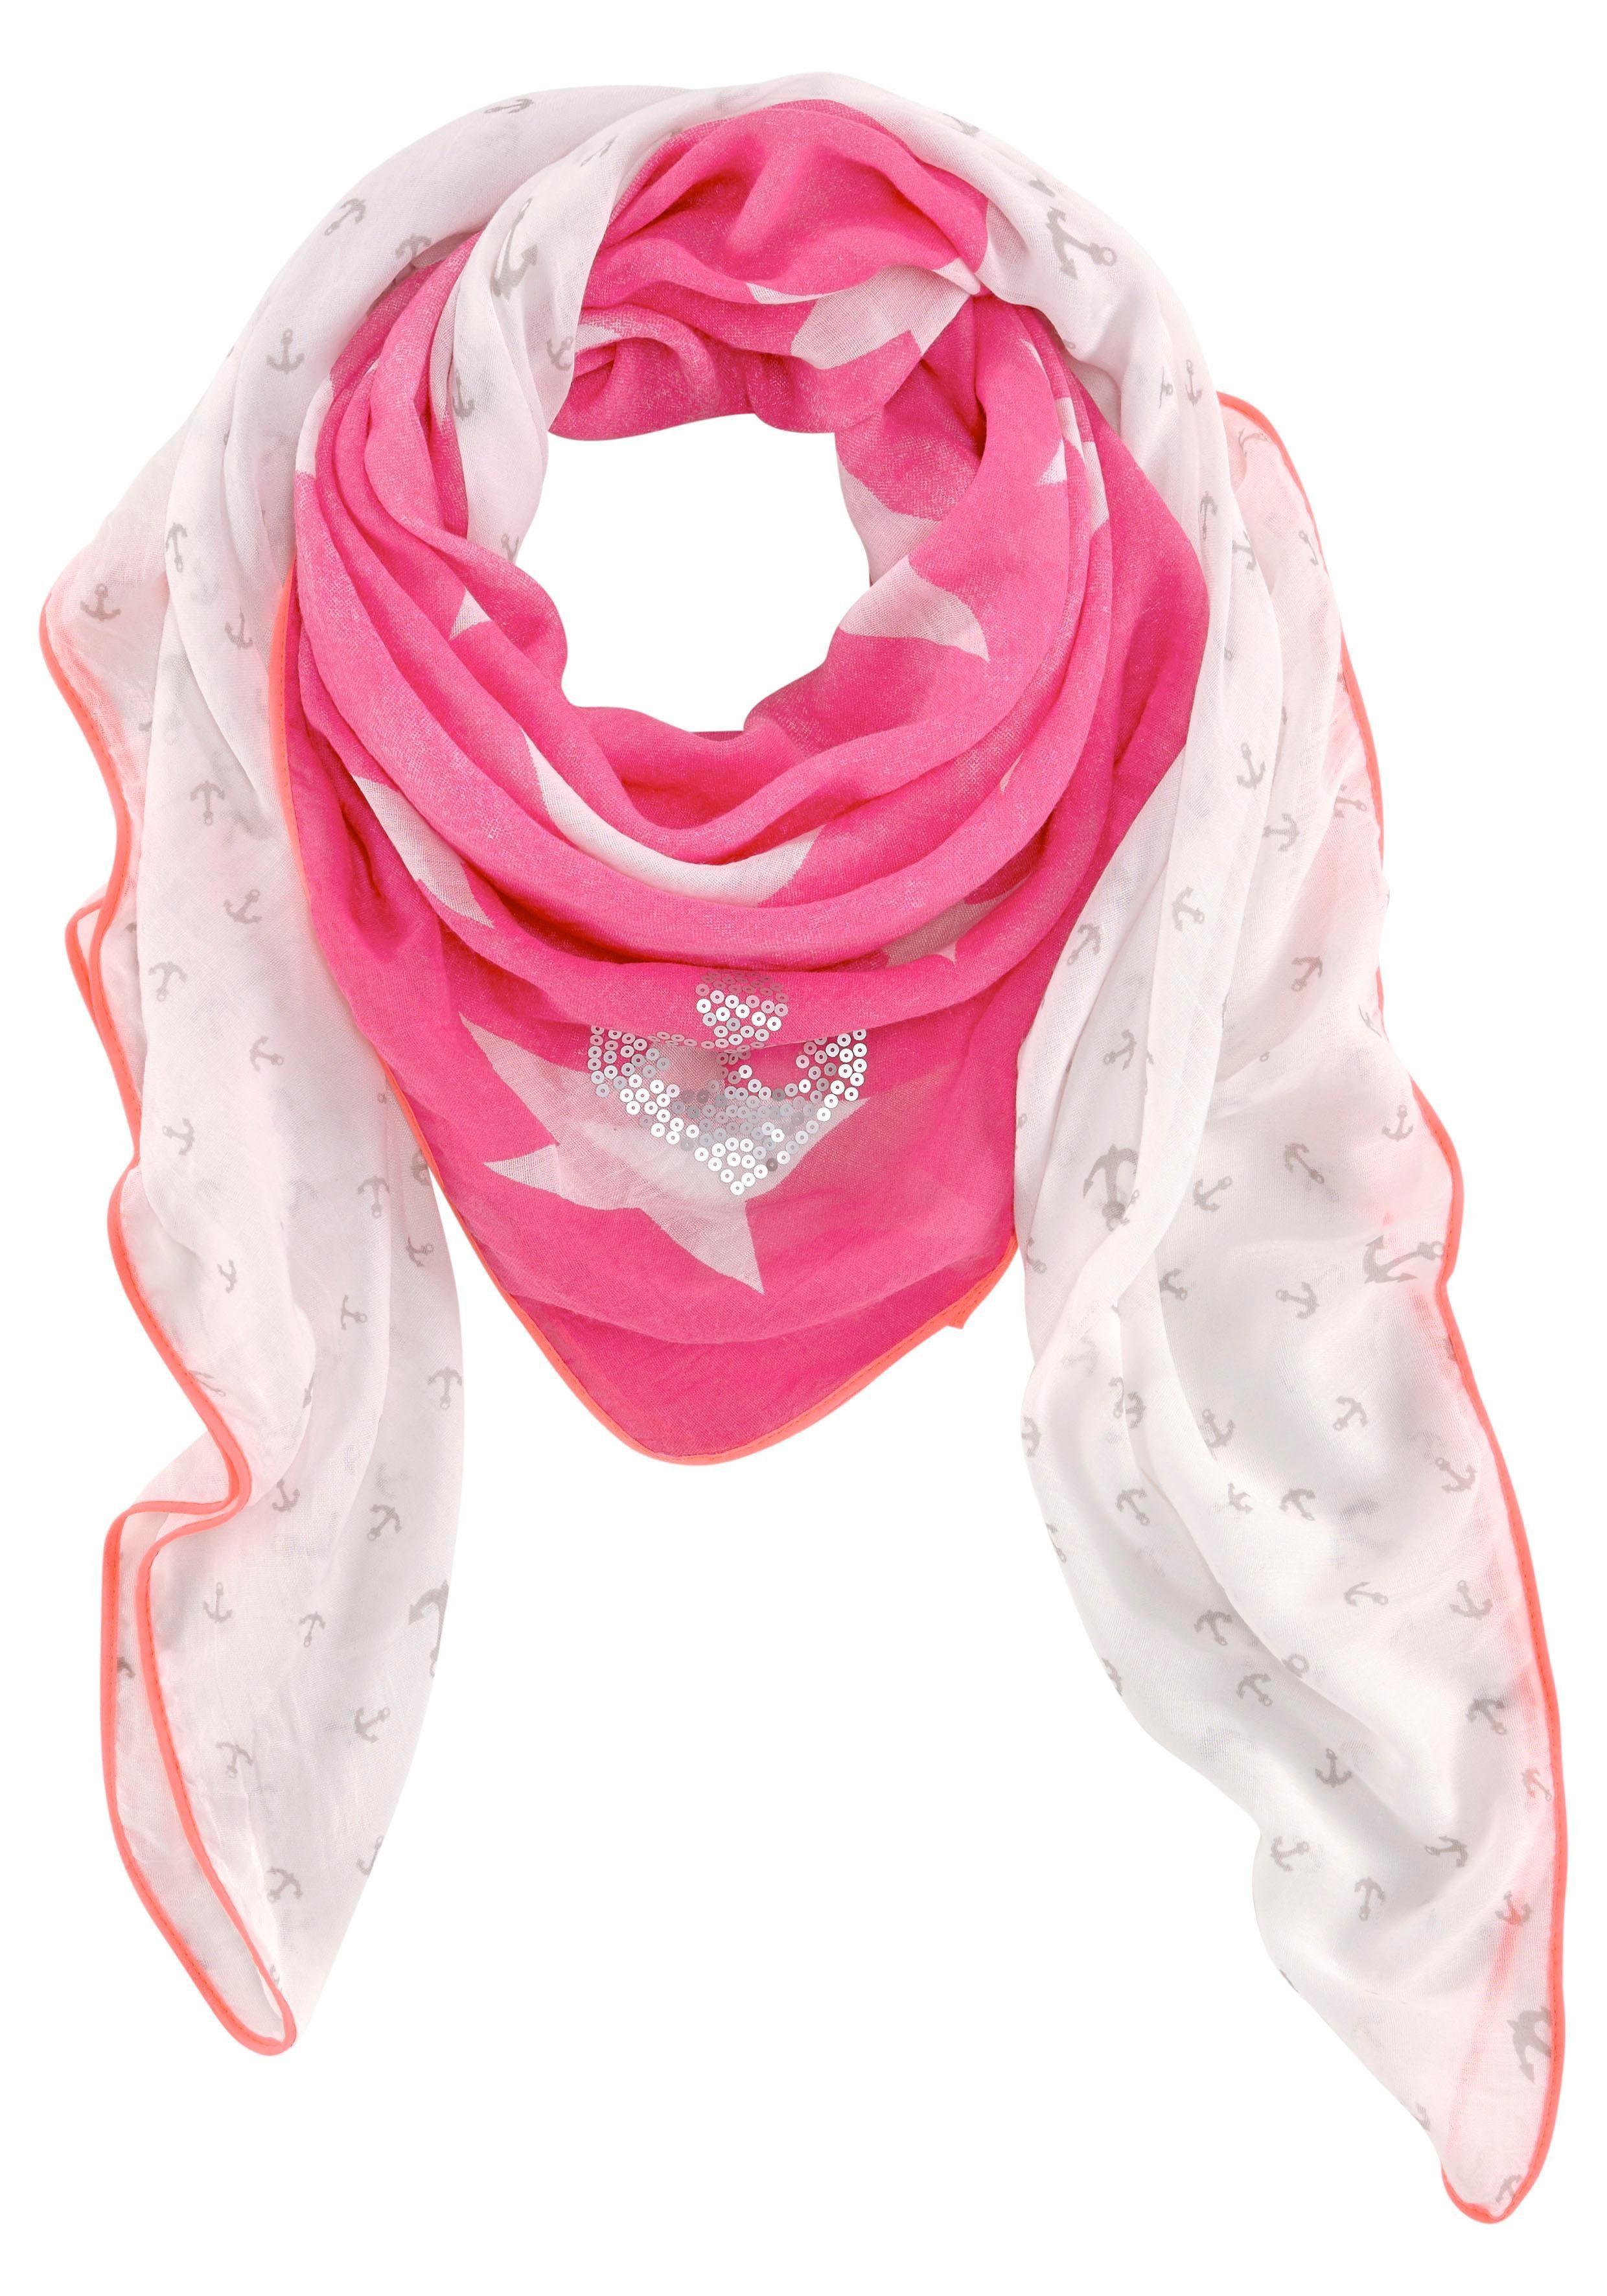 Colours Cosmetic Modetuch XXL-Tuch mit Pailletten, Anker- und Sternprint allover, Neonrand